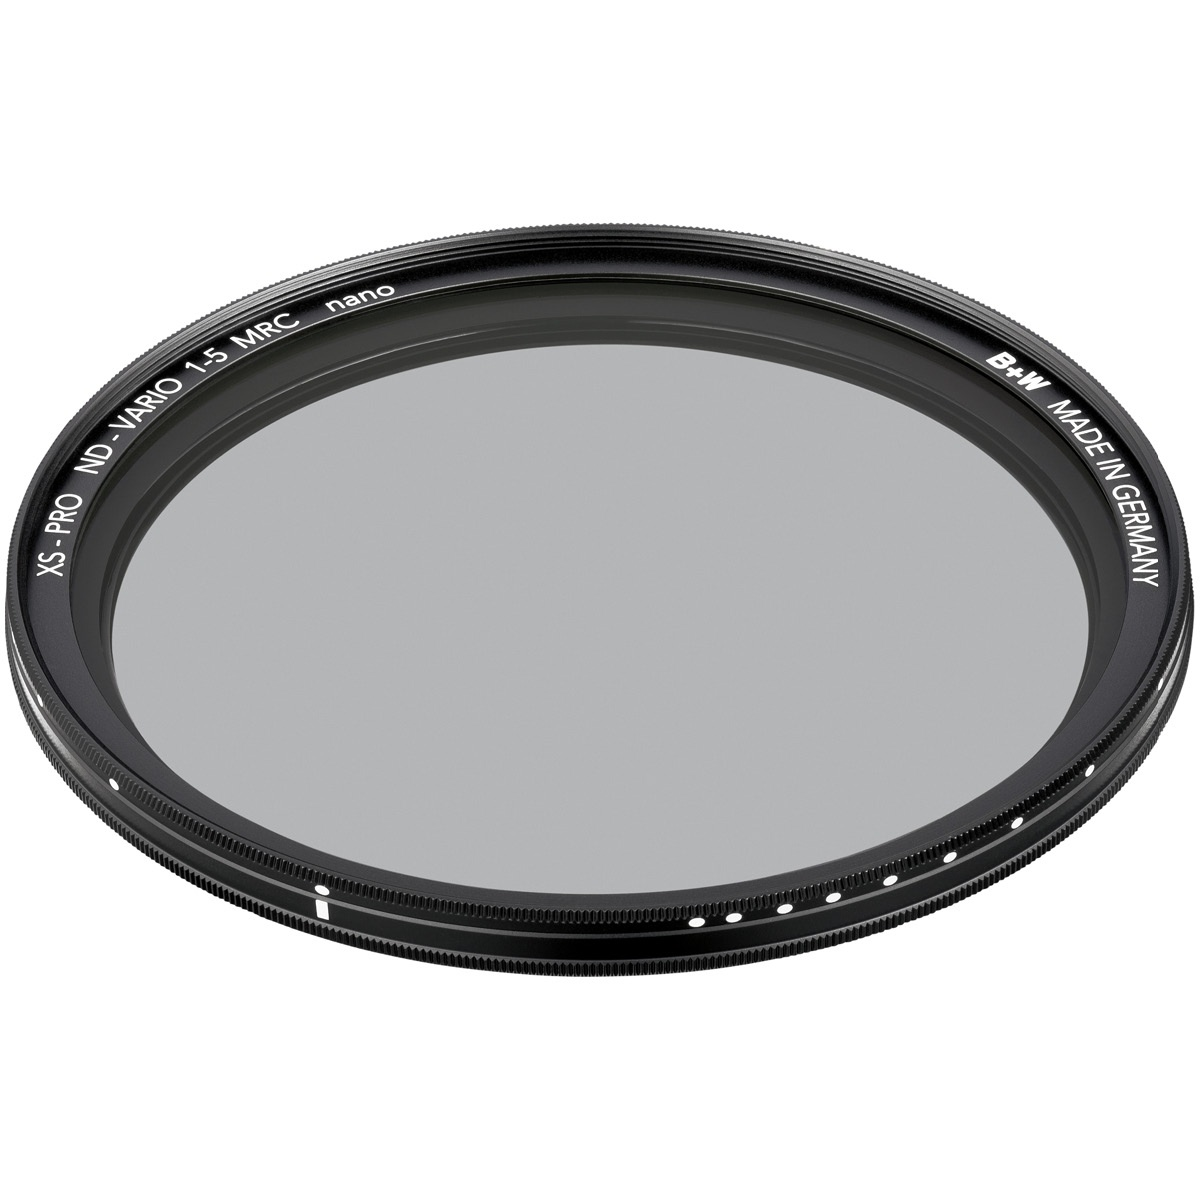 B+W Graufilter 82 mm XS-Pro Vario +1 - +5